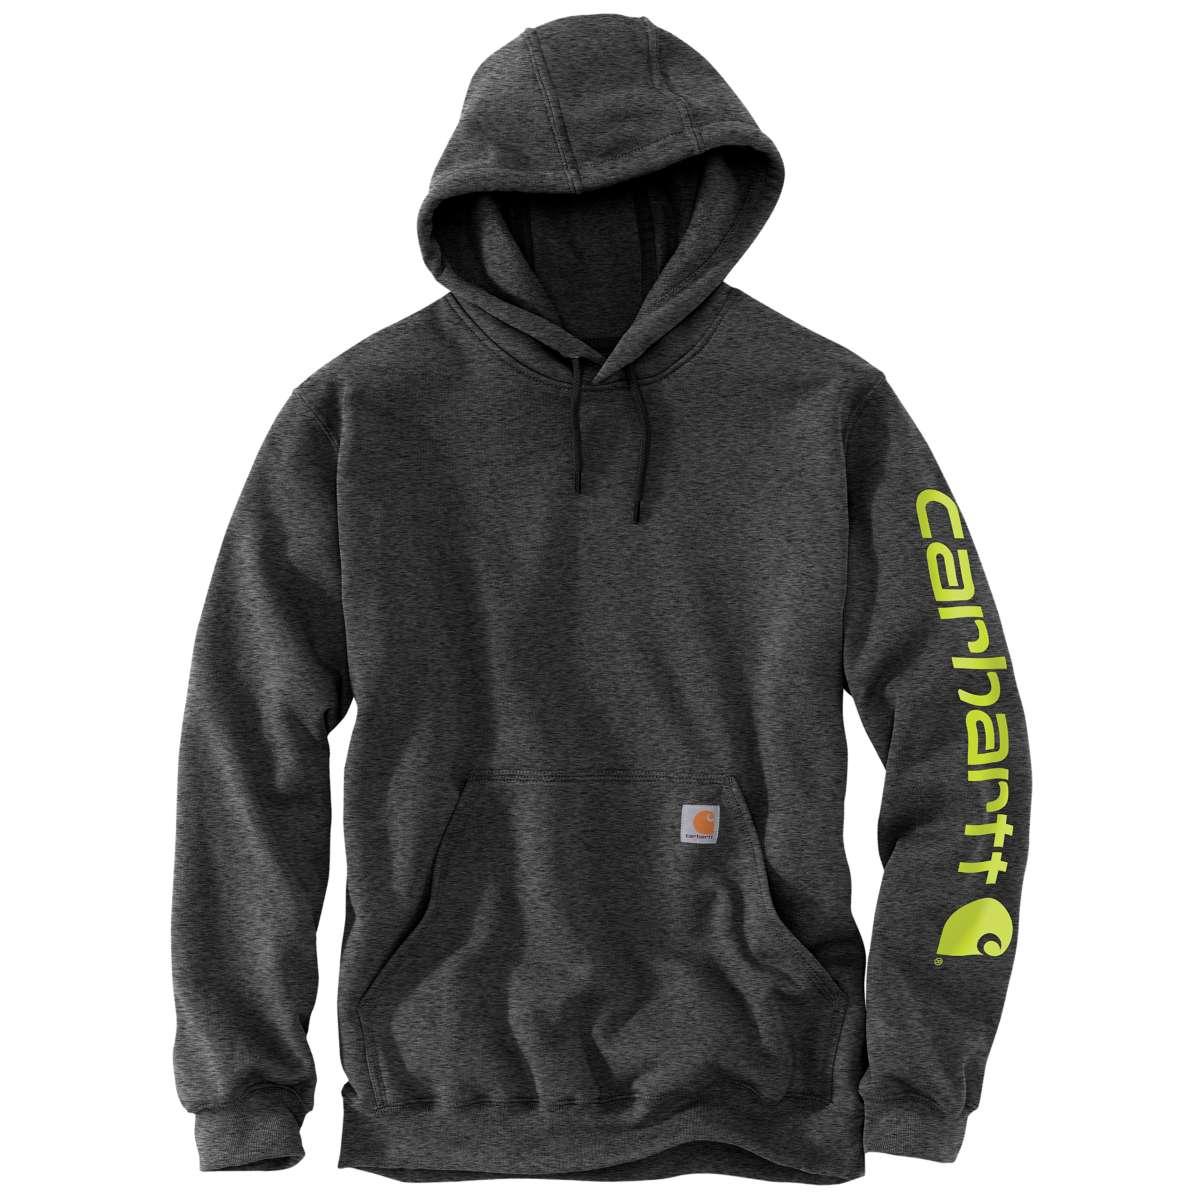 Carhartt Men's K288 Signature Sleeve Logo Hoodie, Extended Sizes - Black, 2XLT